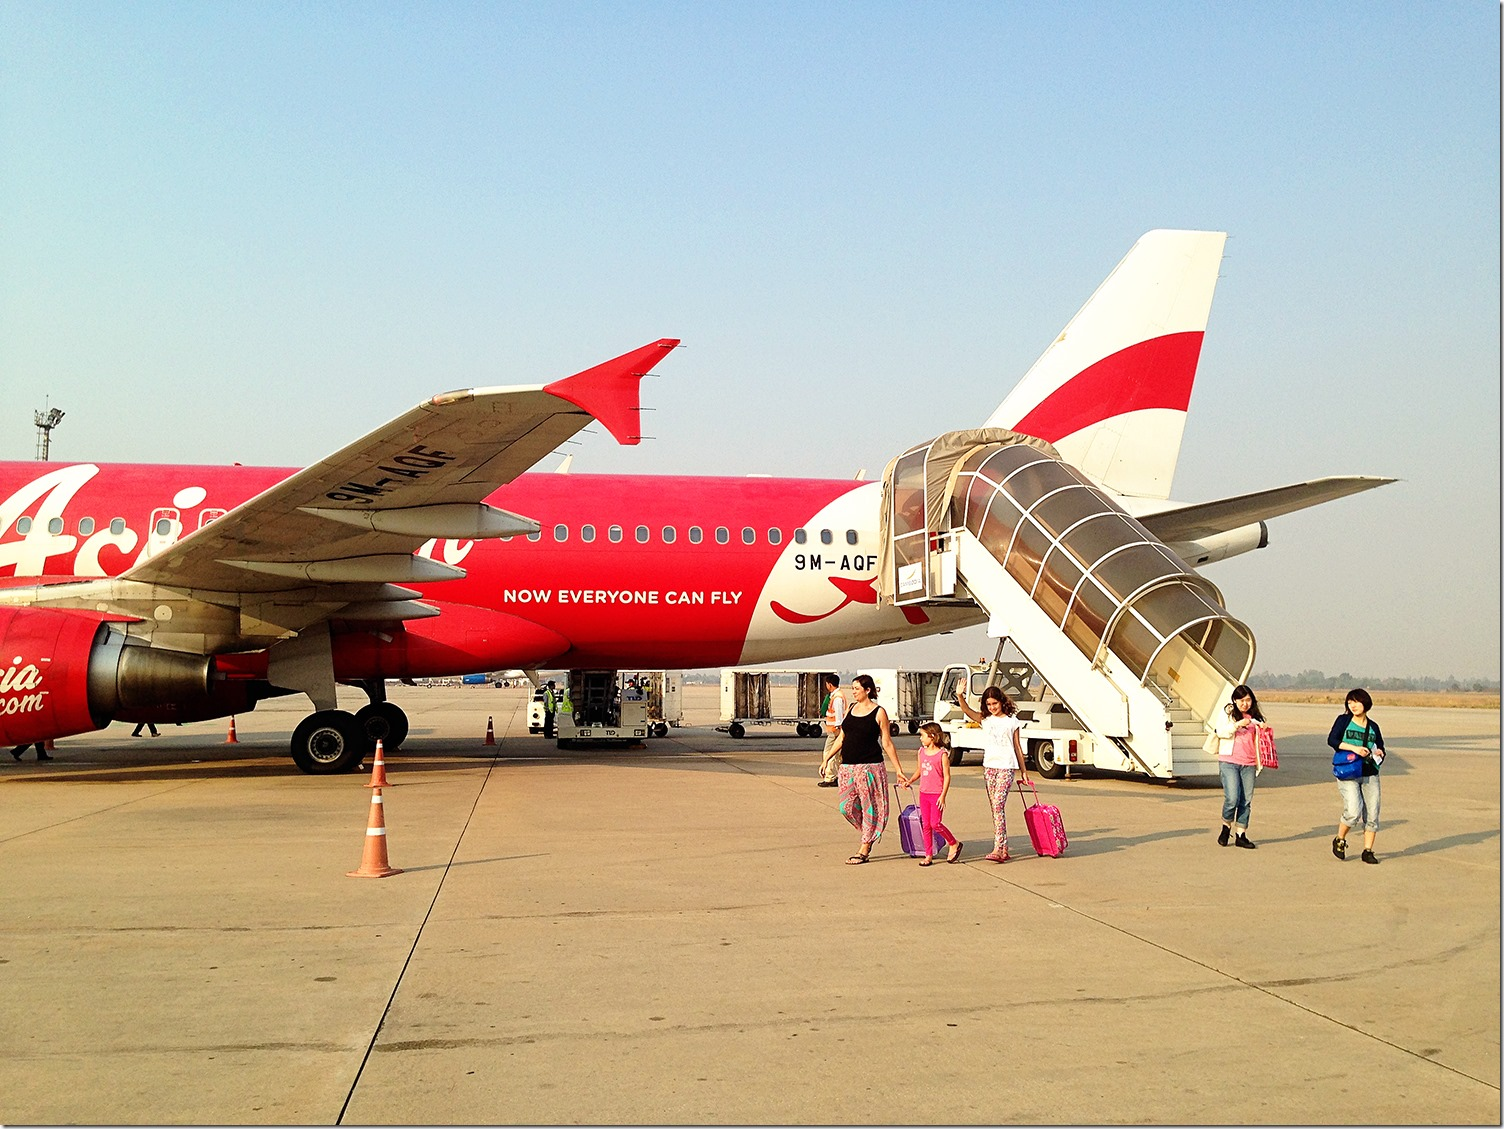 Air Asia to Siem Reap